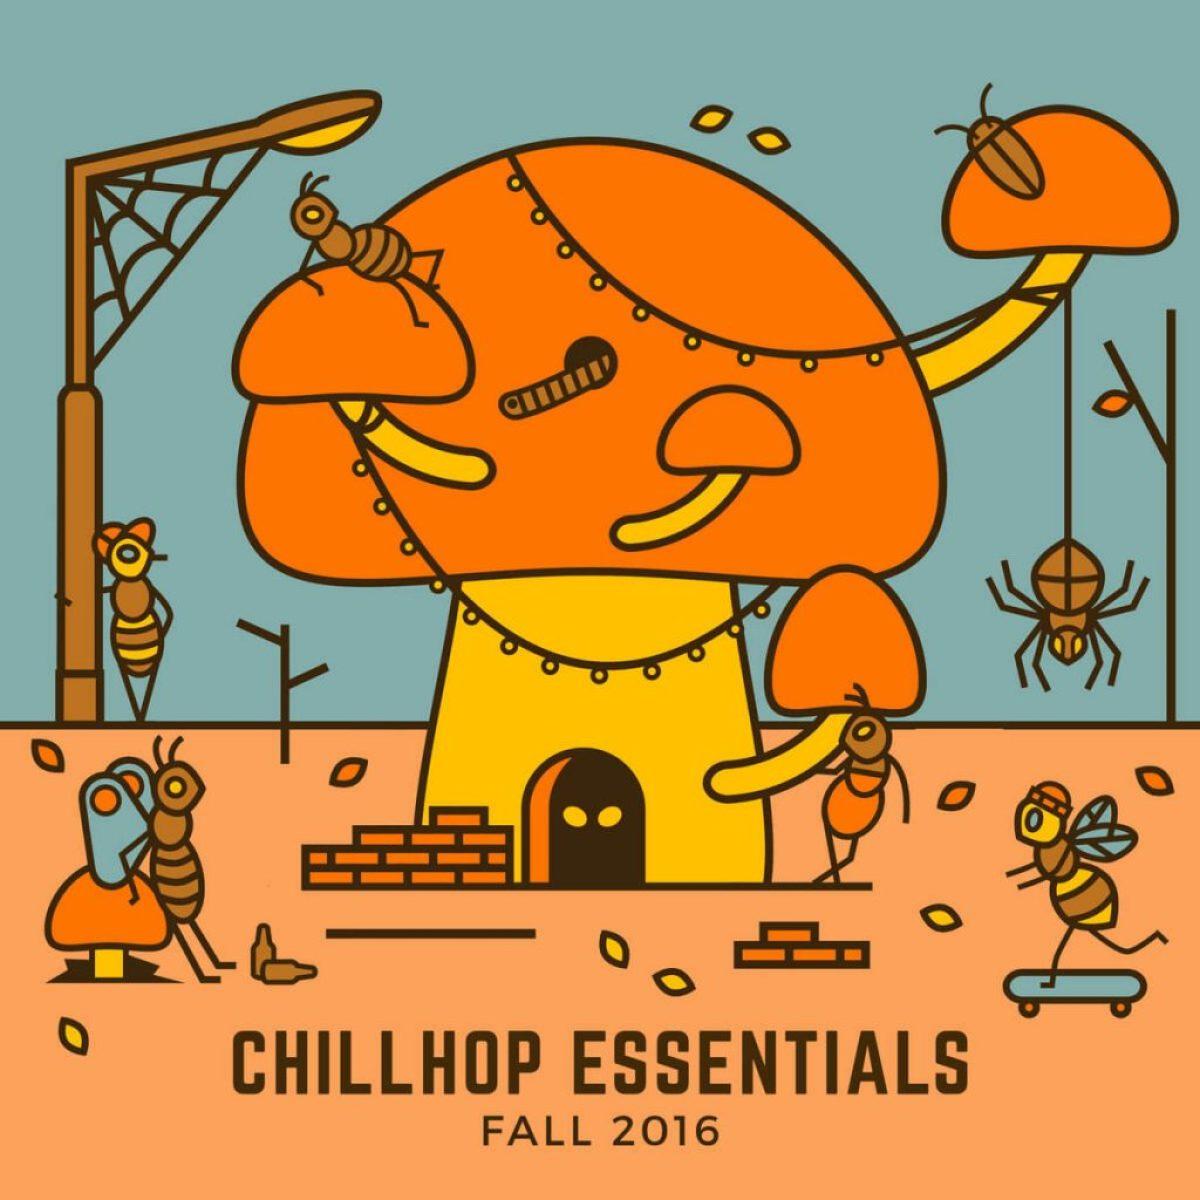 chillhop-essentials-fall-2016